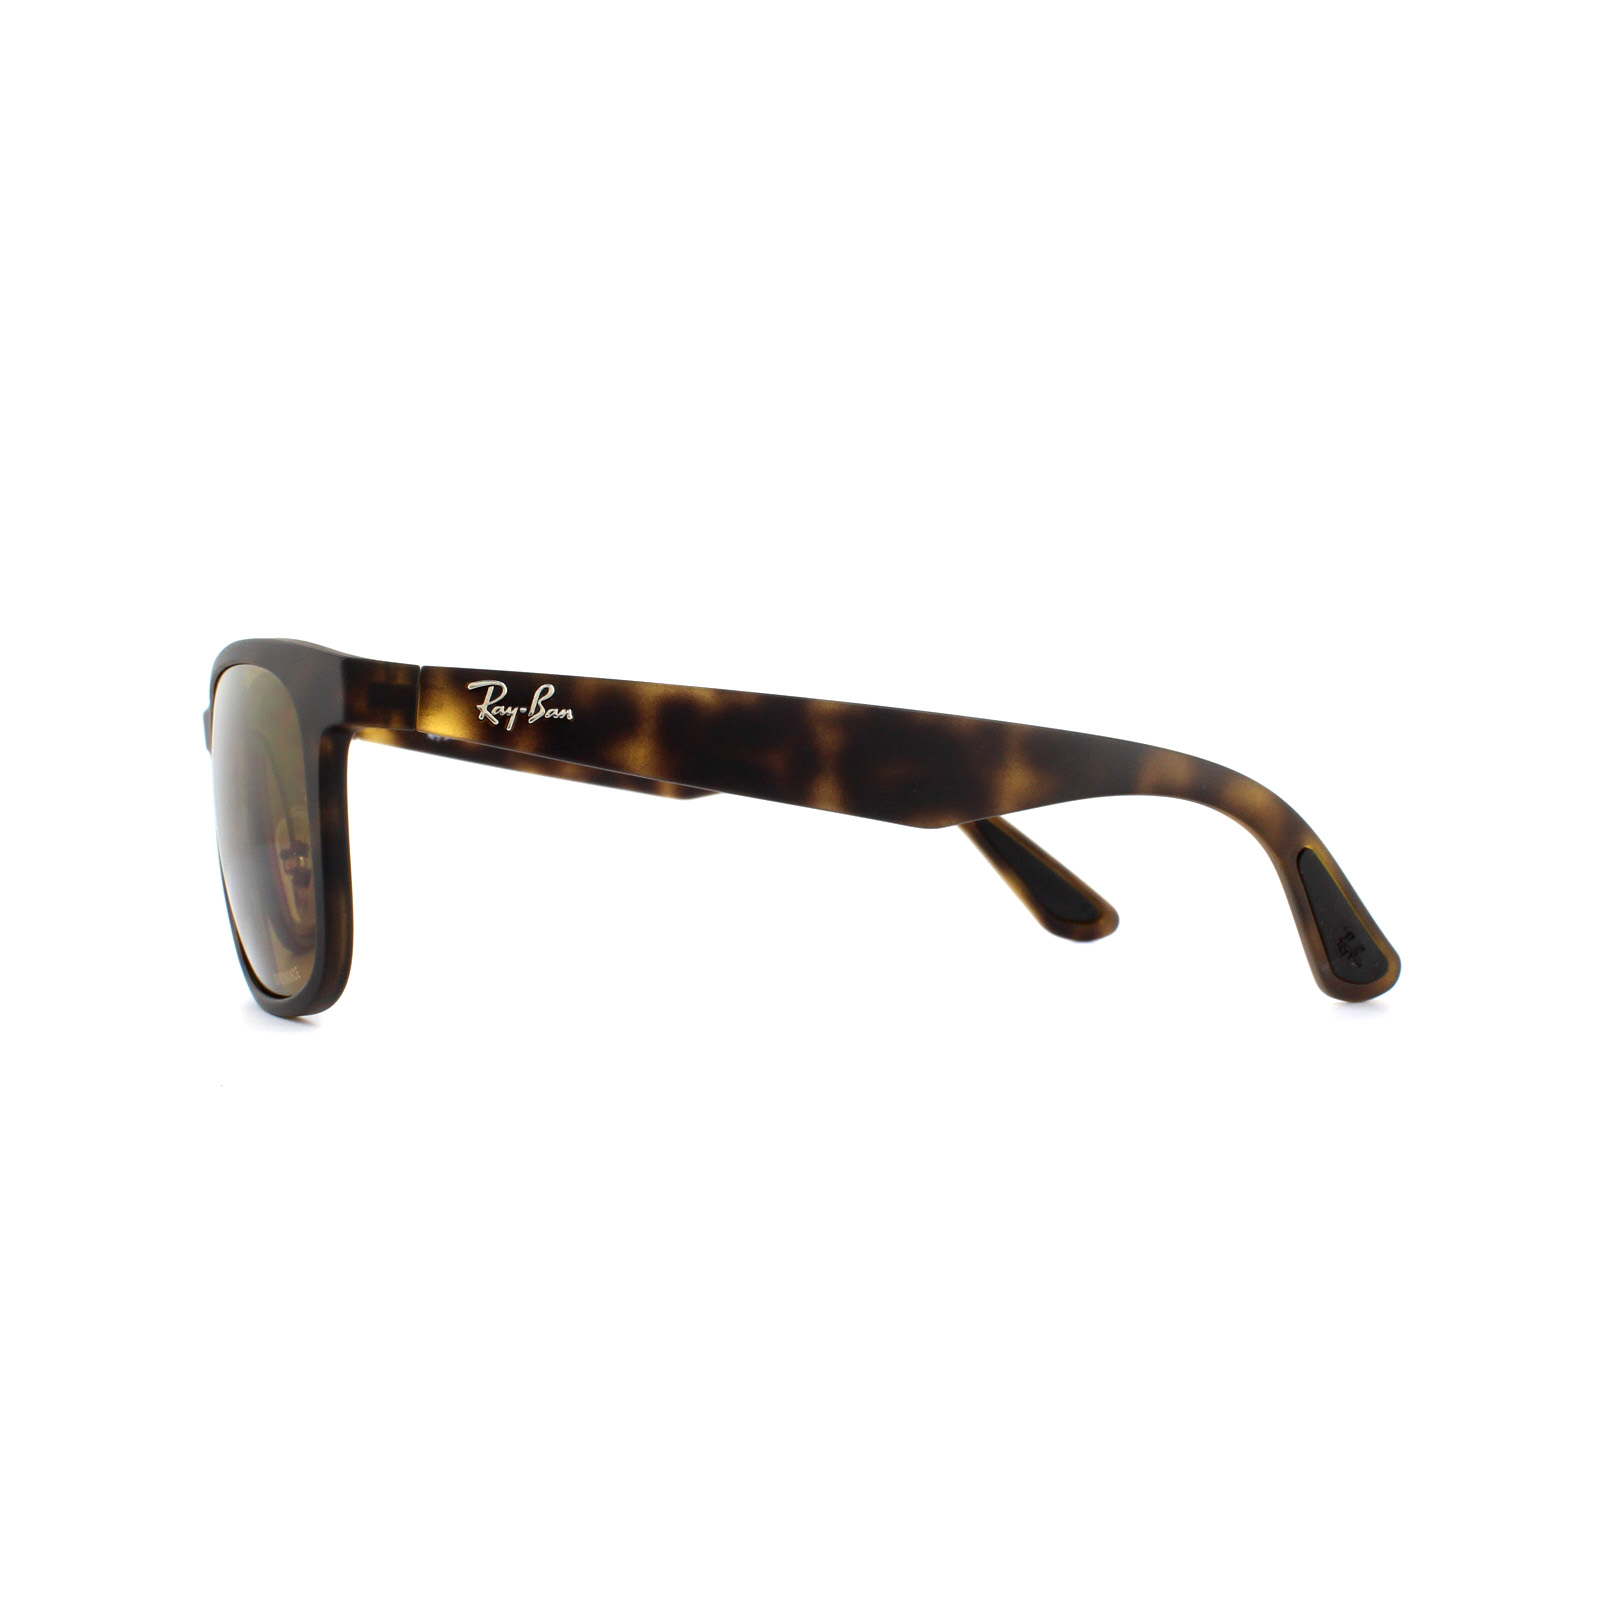 d7d29163f2 Sentinel Ray-Ban Sunglasses RB4263 894 A3 Matte Havana Bronze Polarized  Miror Chromance